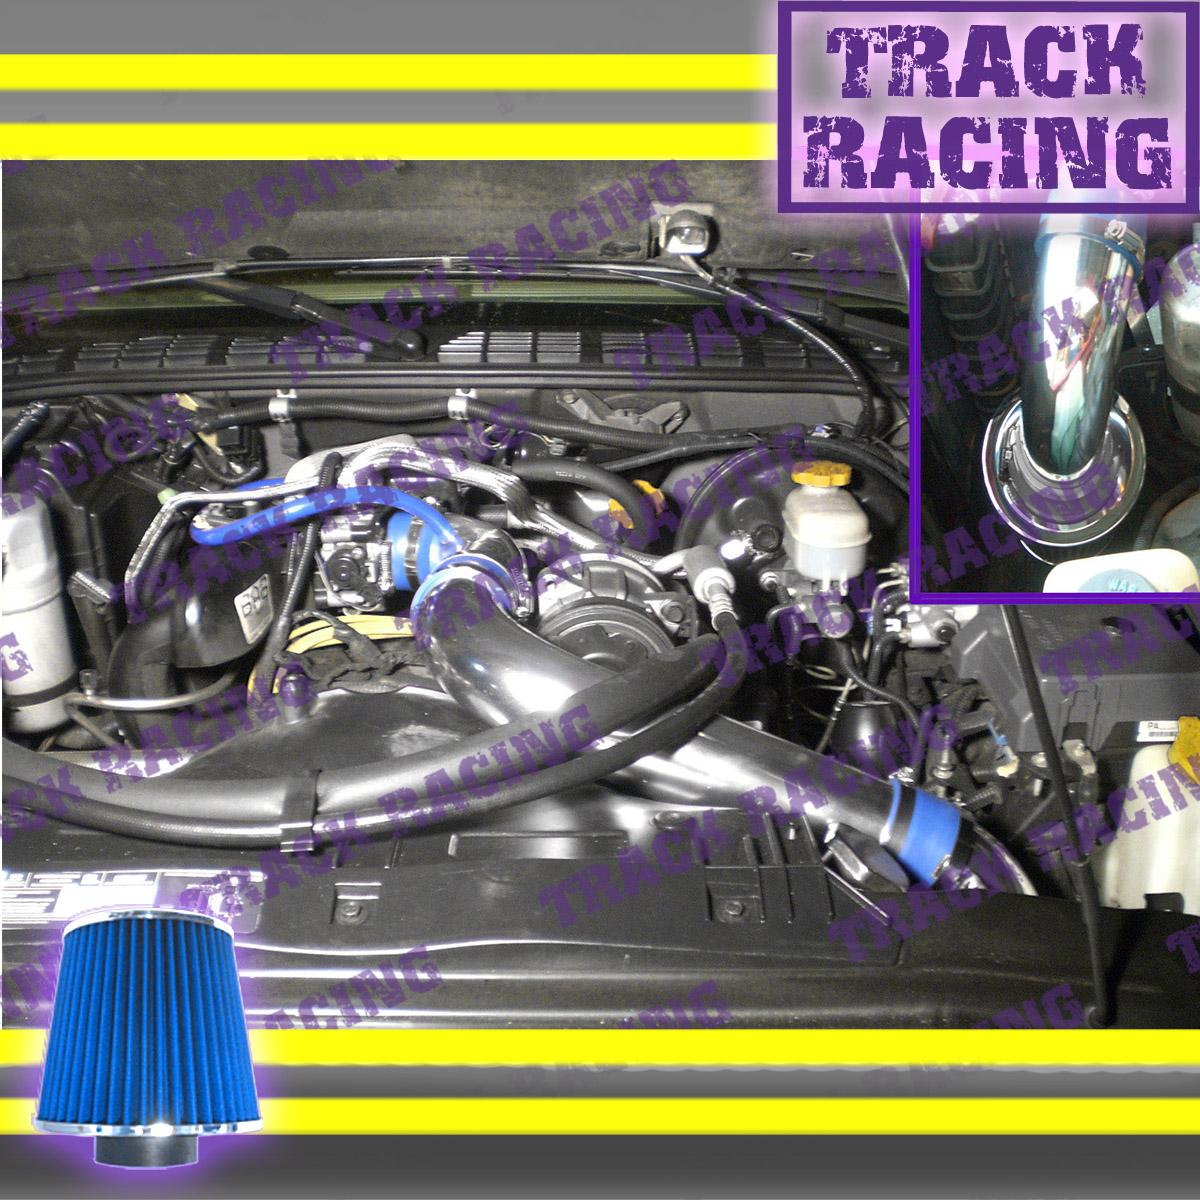 2003 Chevy S10 Vacuum Hose Diagram Further 2001 Chevy S10 Vacuum Line